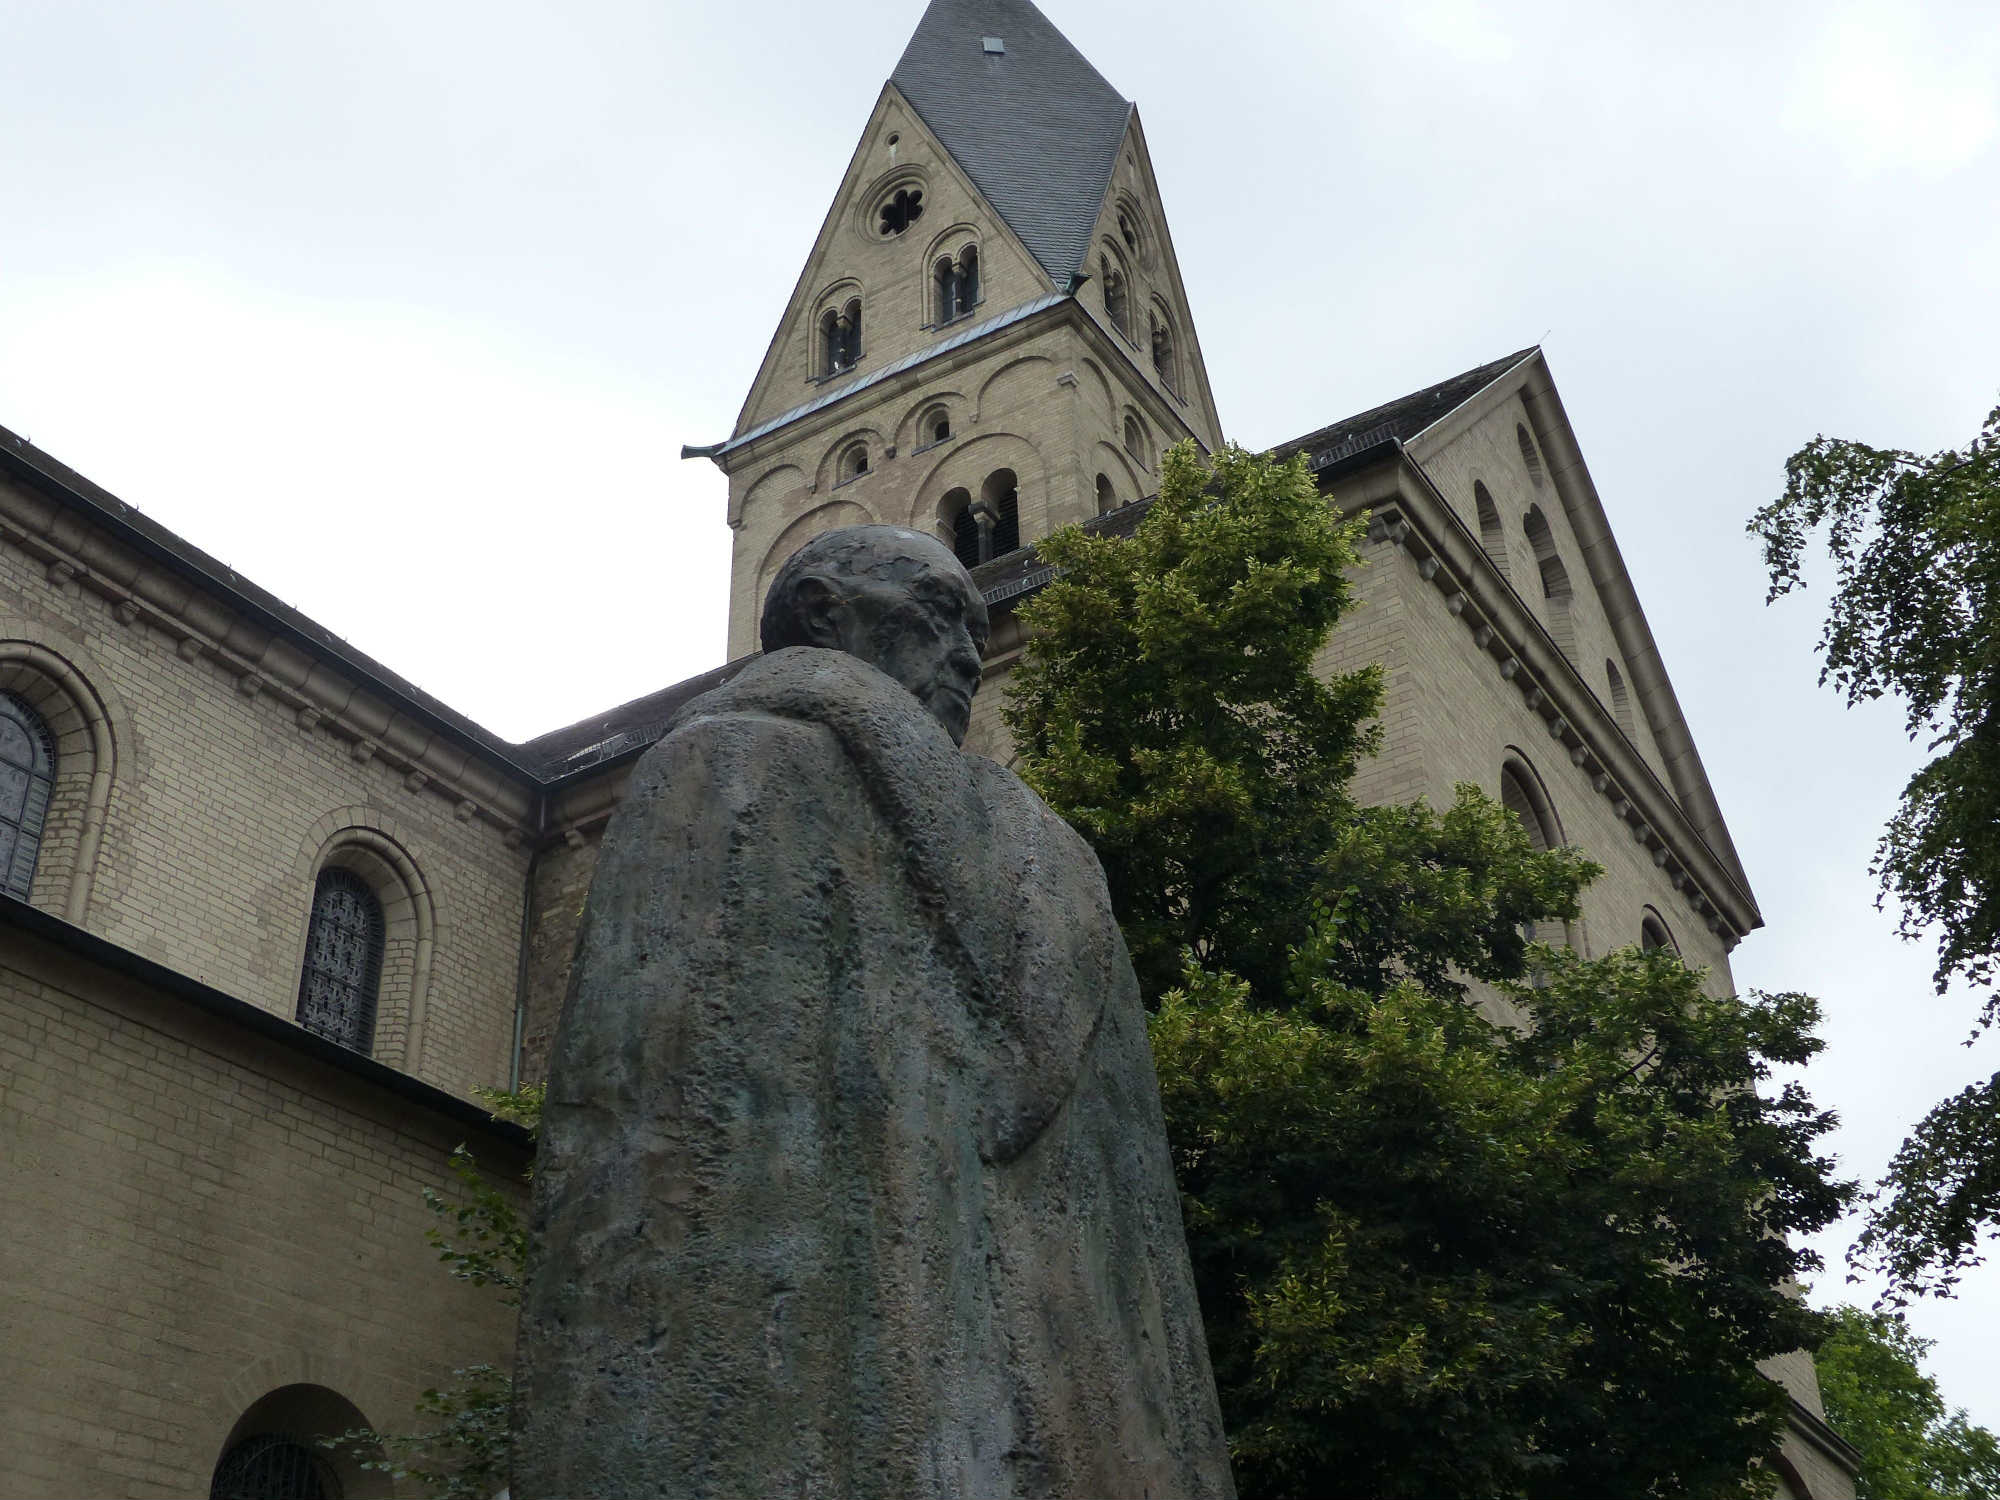 Spomenik Konradu Adenaueru ispred Bazilike Svetih apostola u Kelnu (Foto: Xipo Enelmundoperdido)